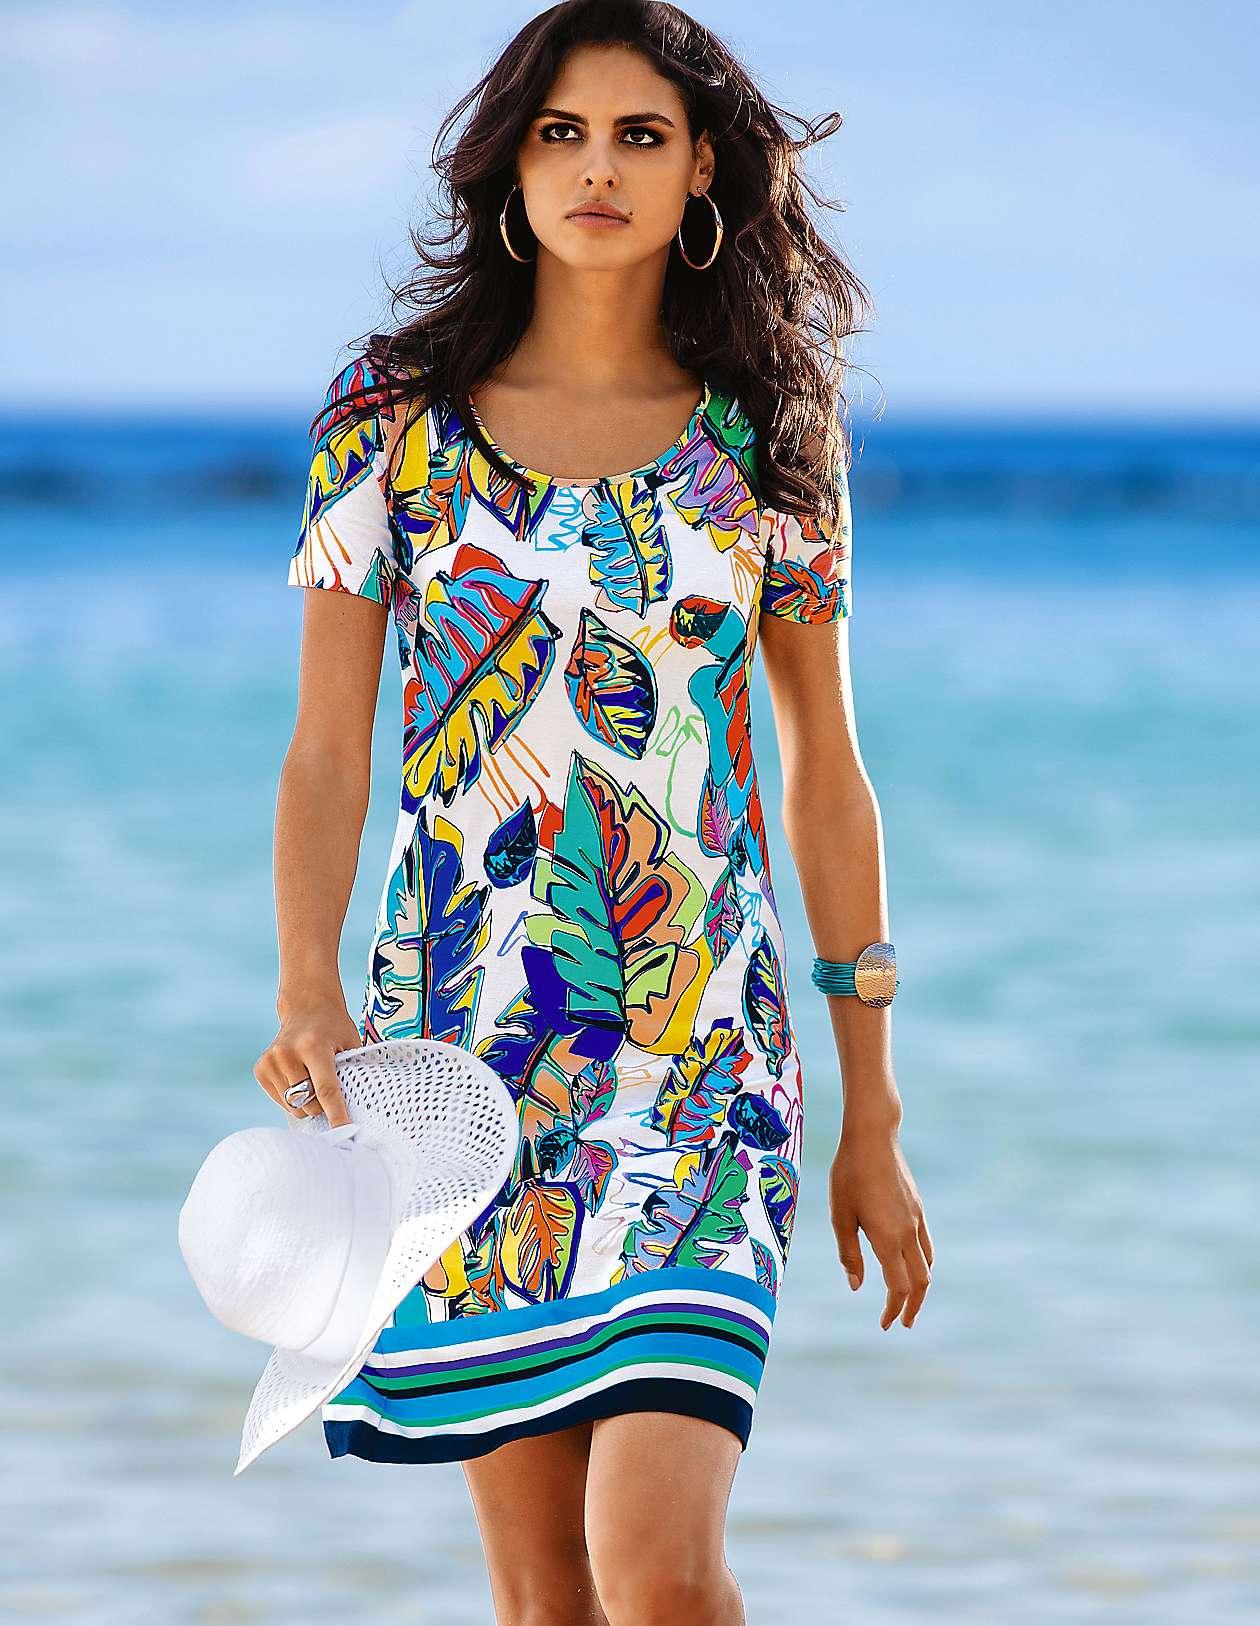 c74b76c8220 Φορέματα & παρεό | MADELEINE Fashion